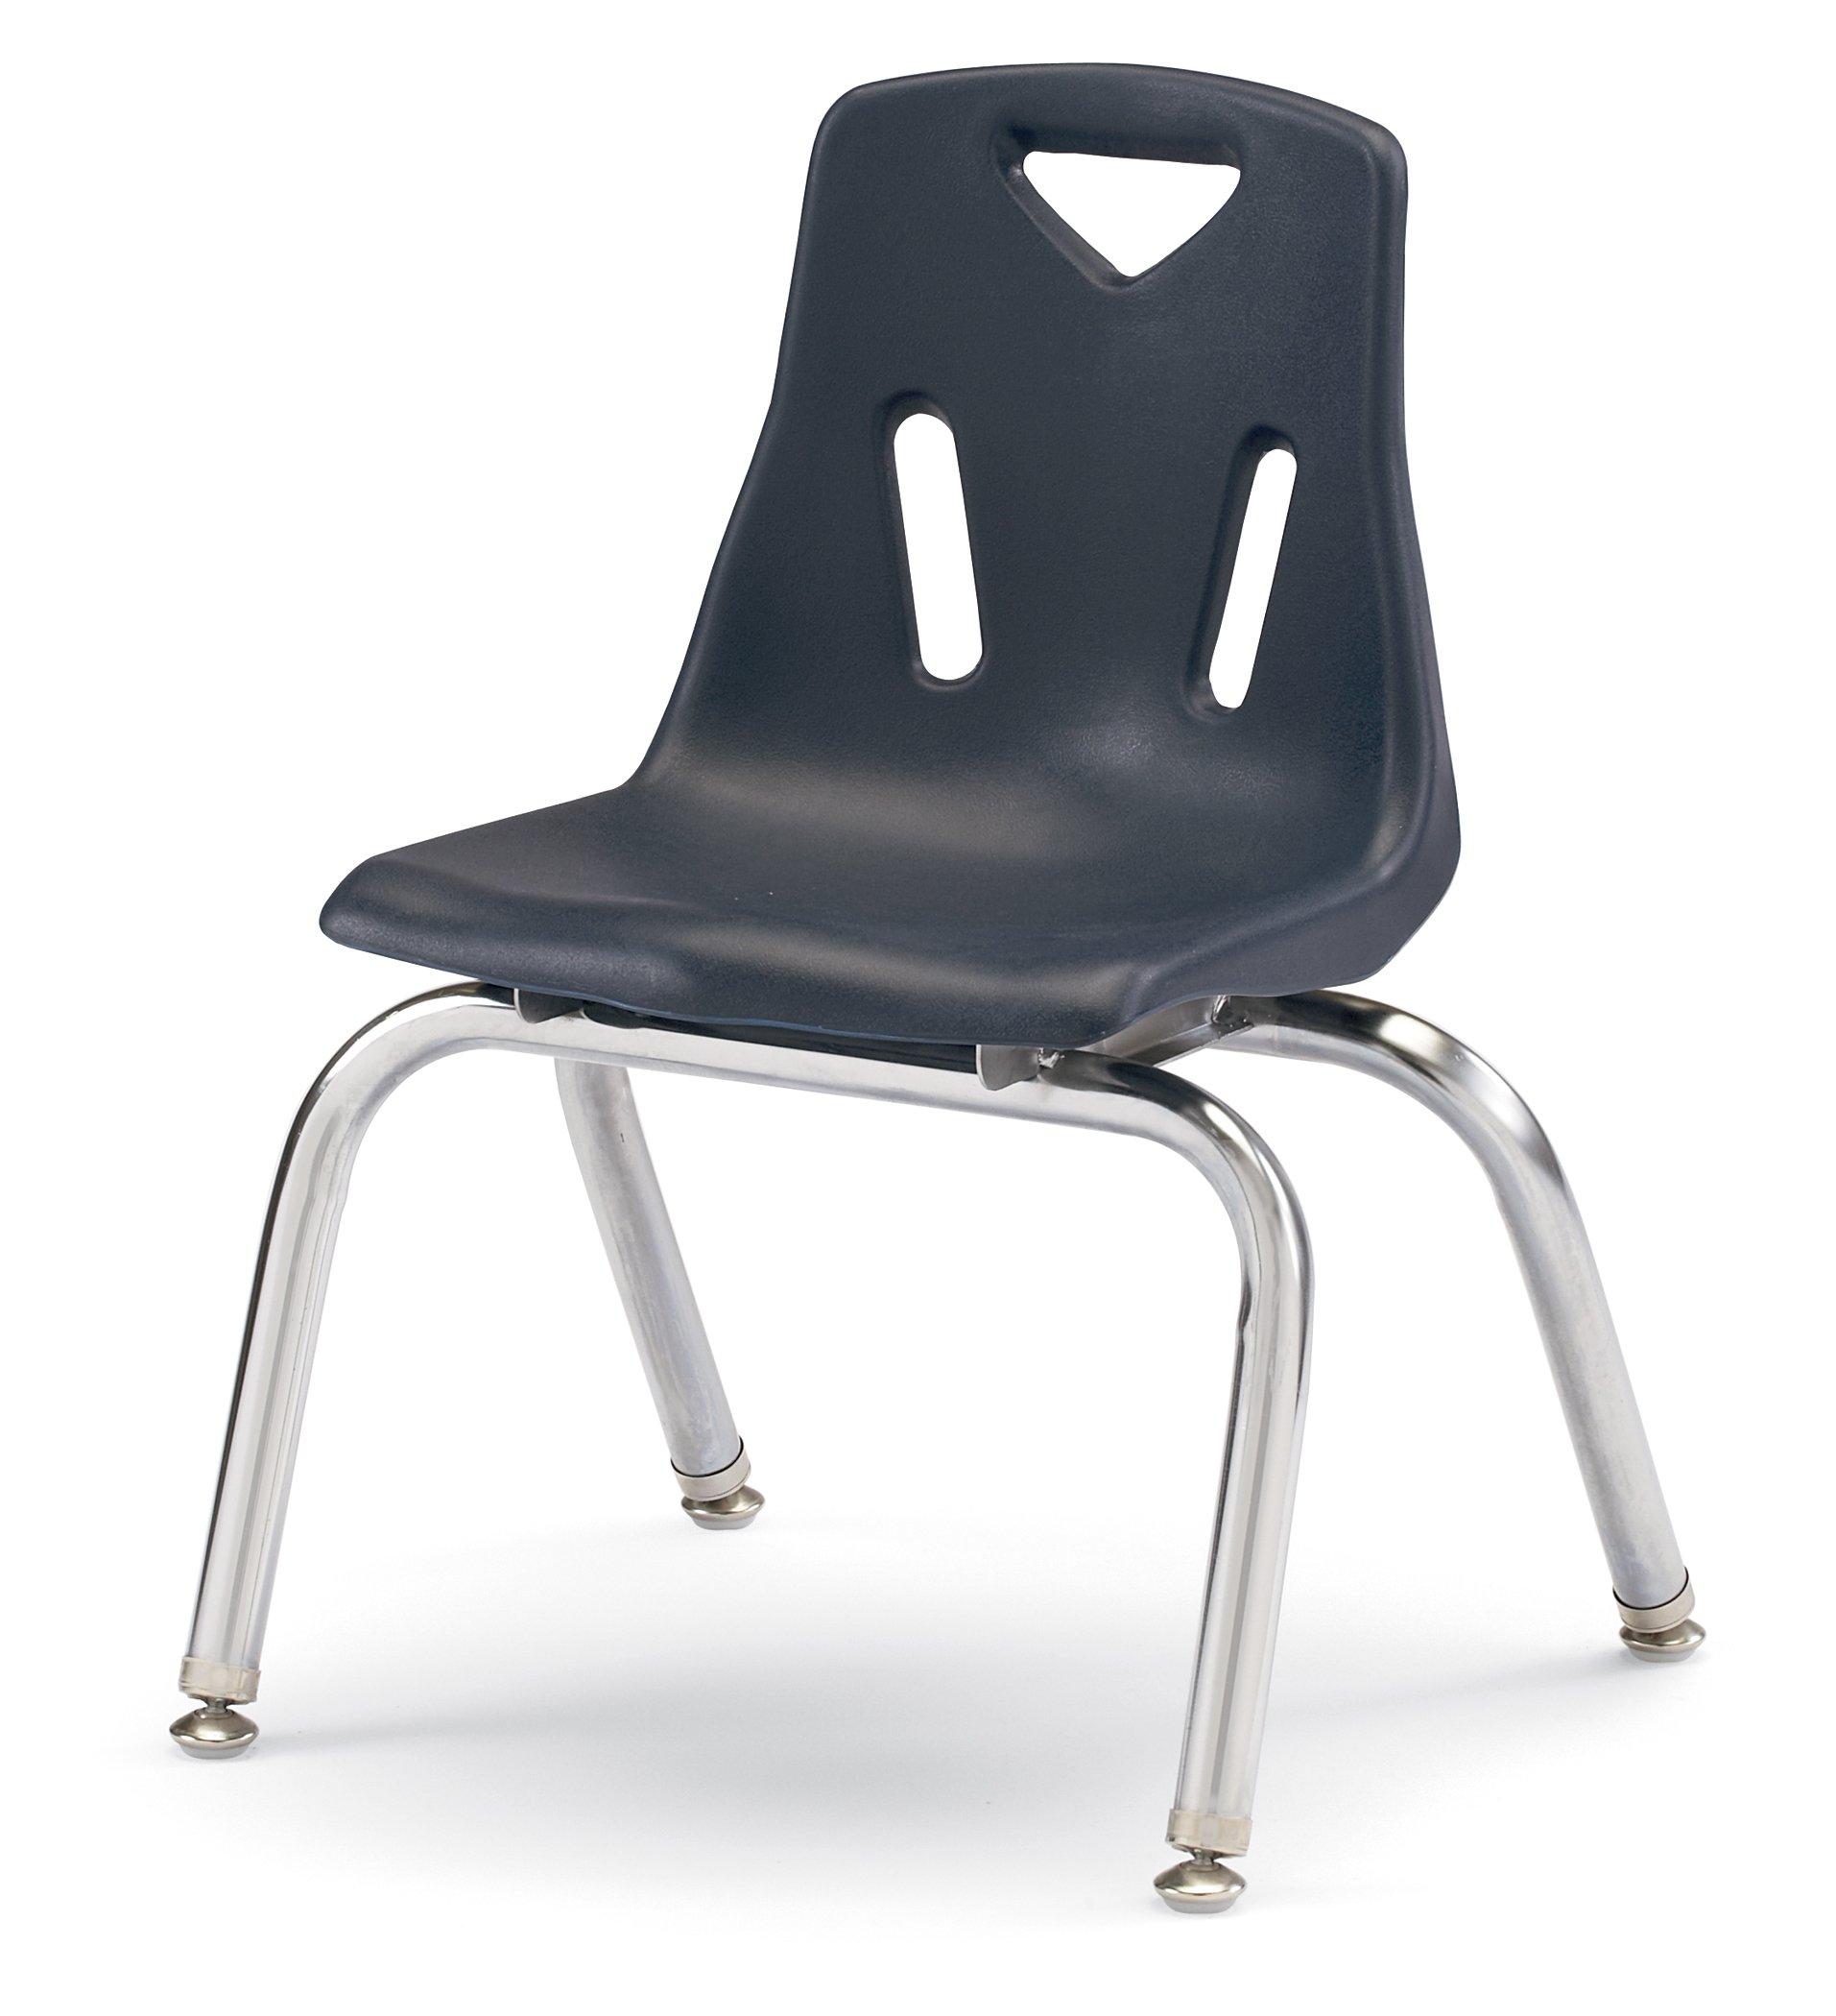 Jonti-Craft Berries 21.5 in. Plastic Kids Chair w Chrome-Plated Legs (12 in. H. - Navy) by Jonti-Craft